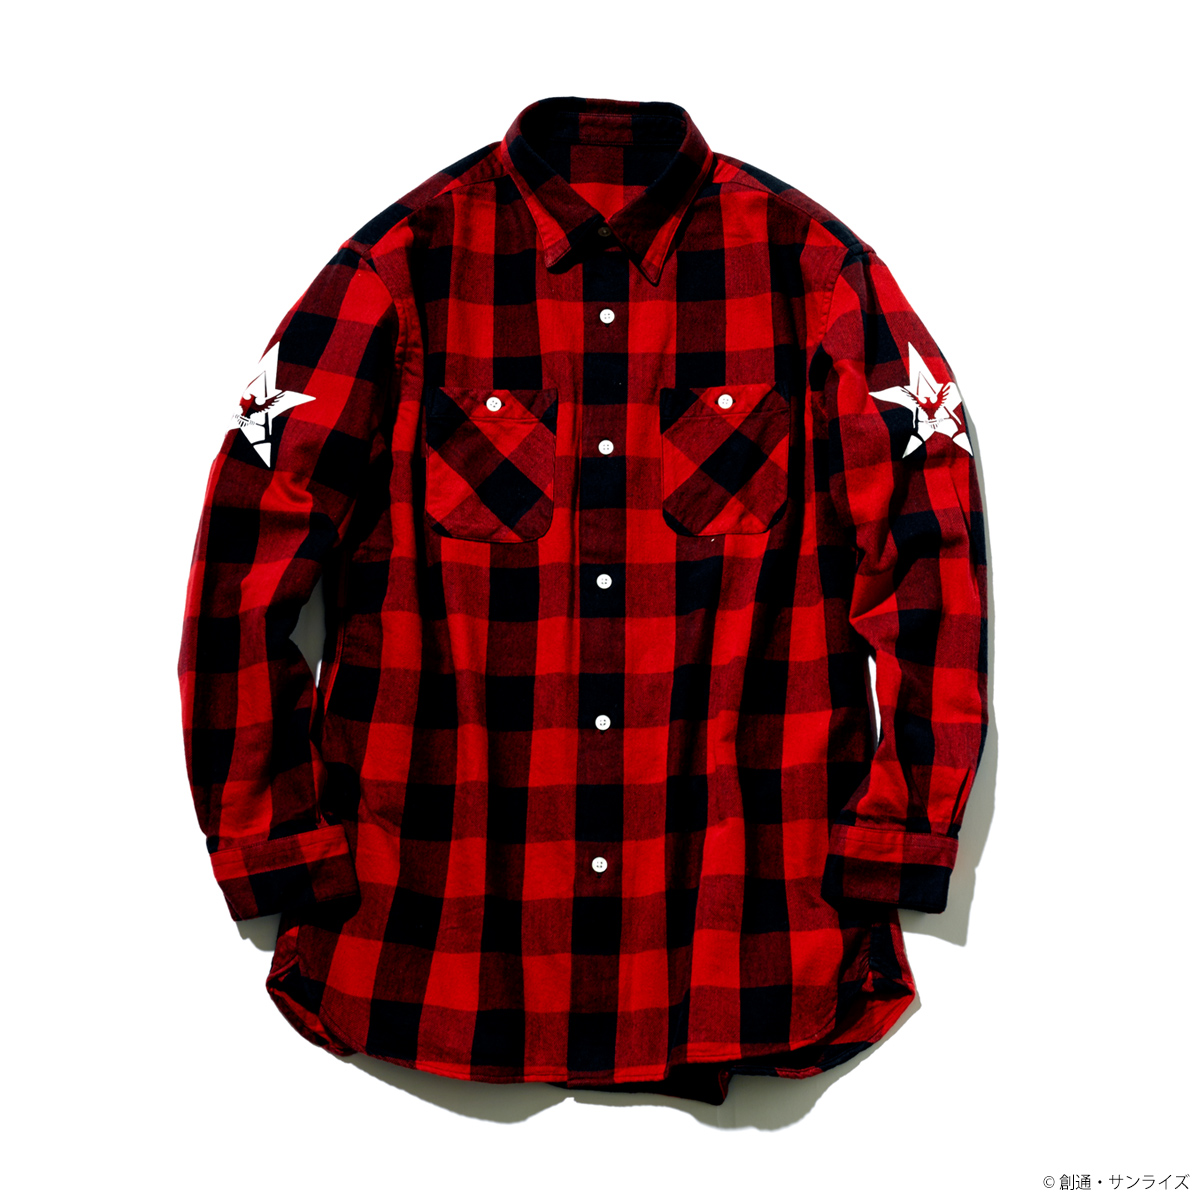 STRICT-G NEW YARK 格紋襯衫